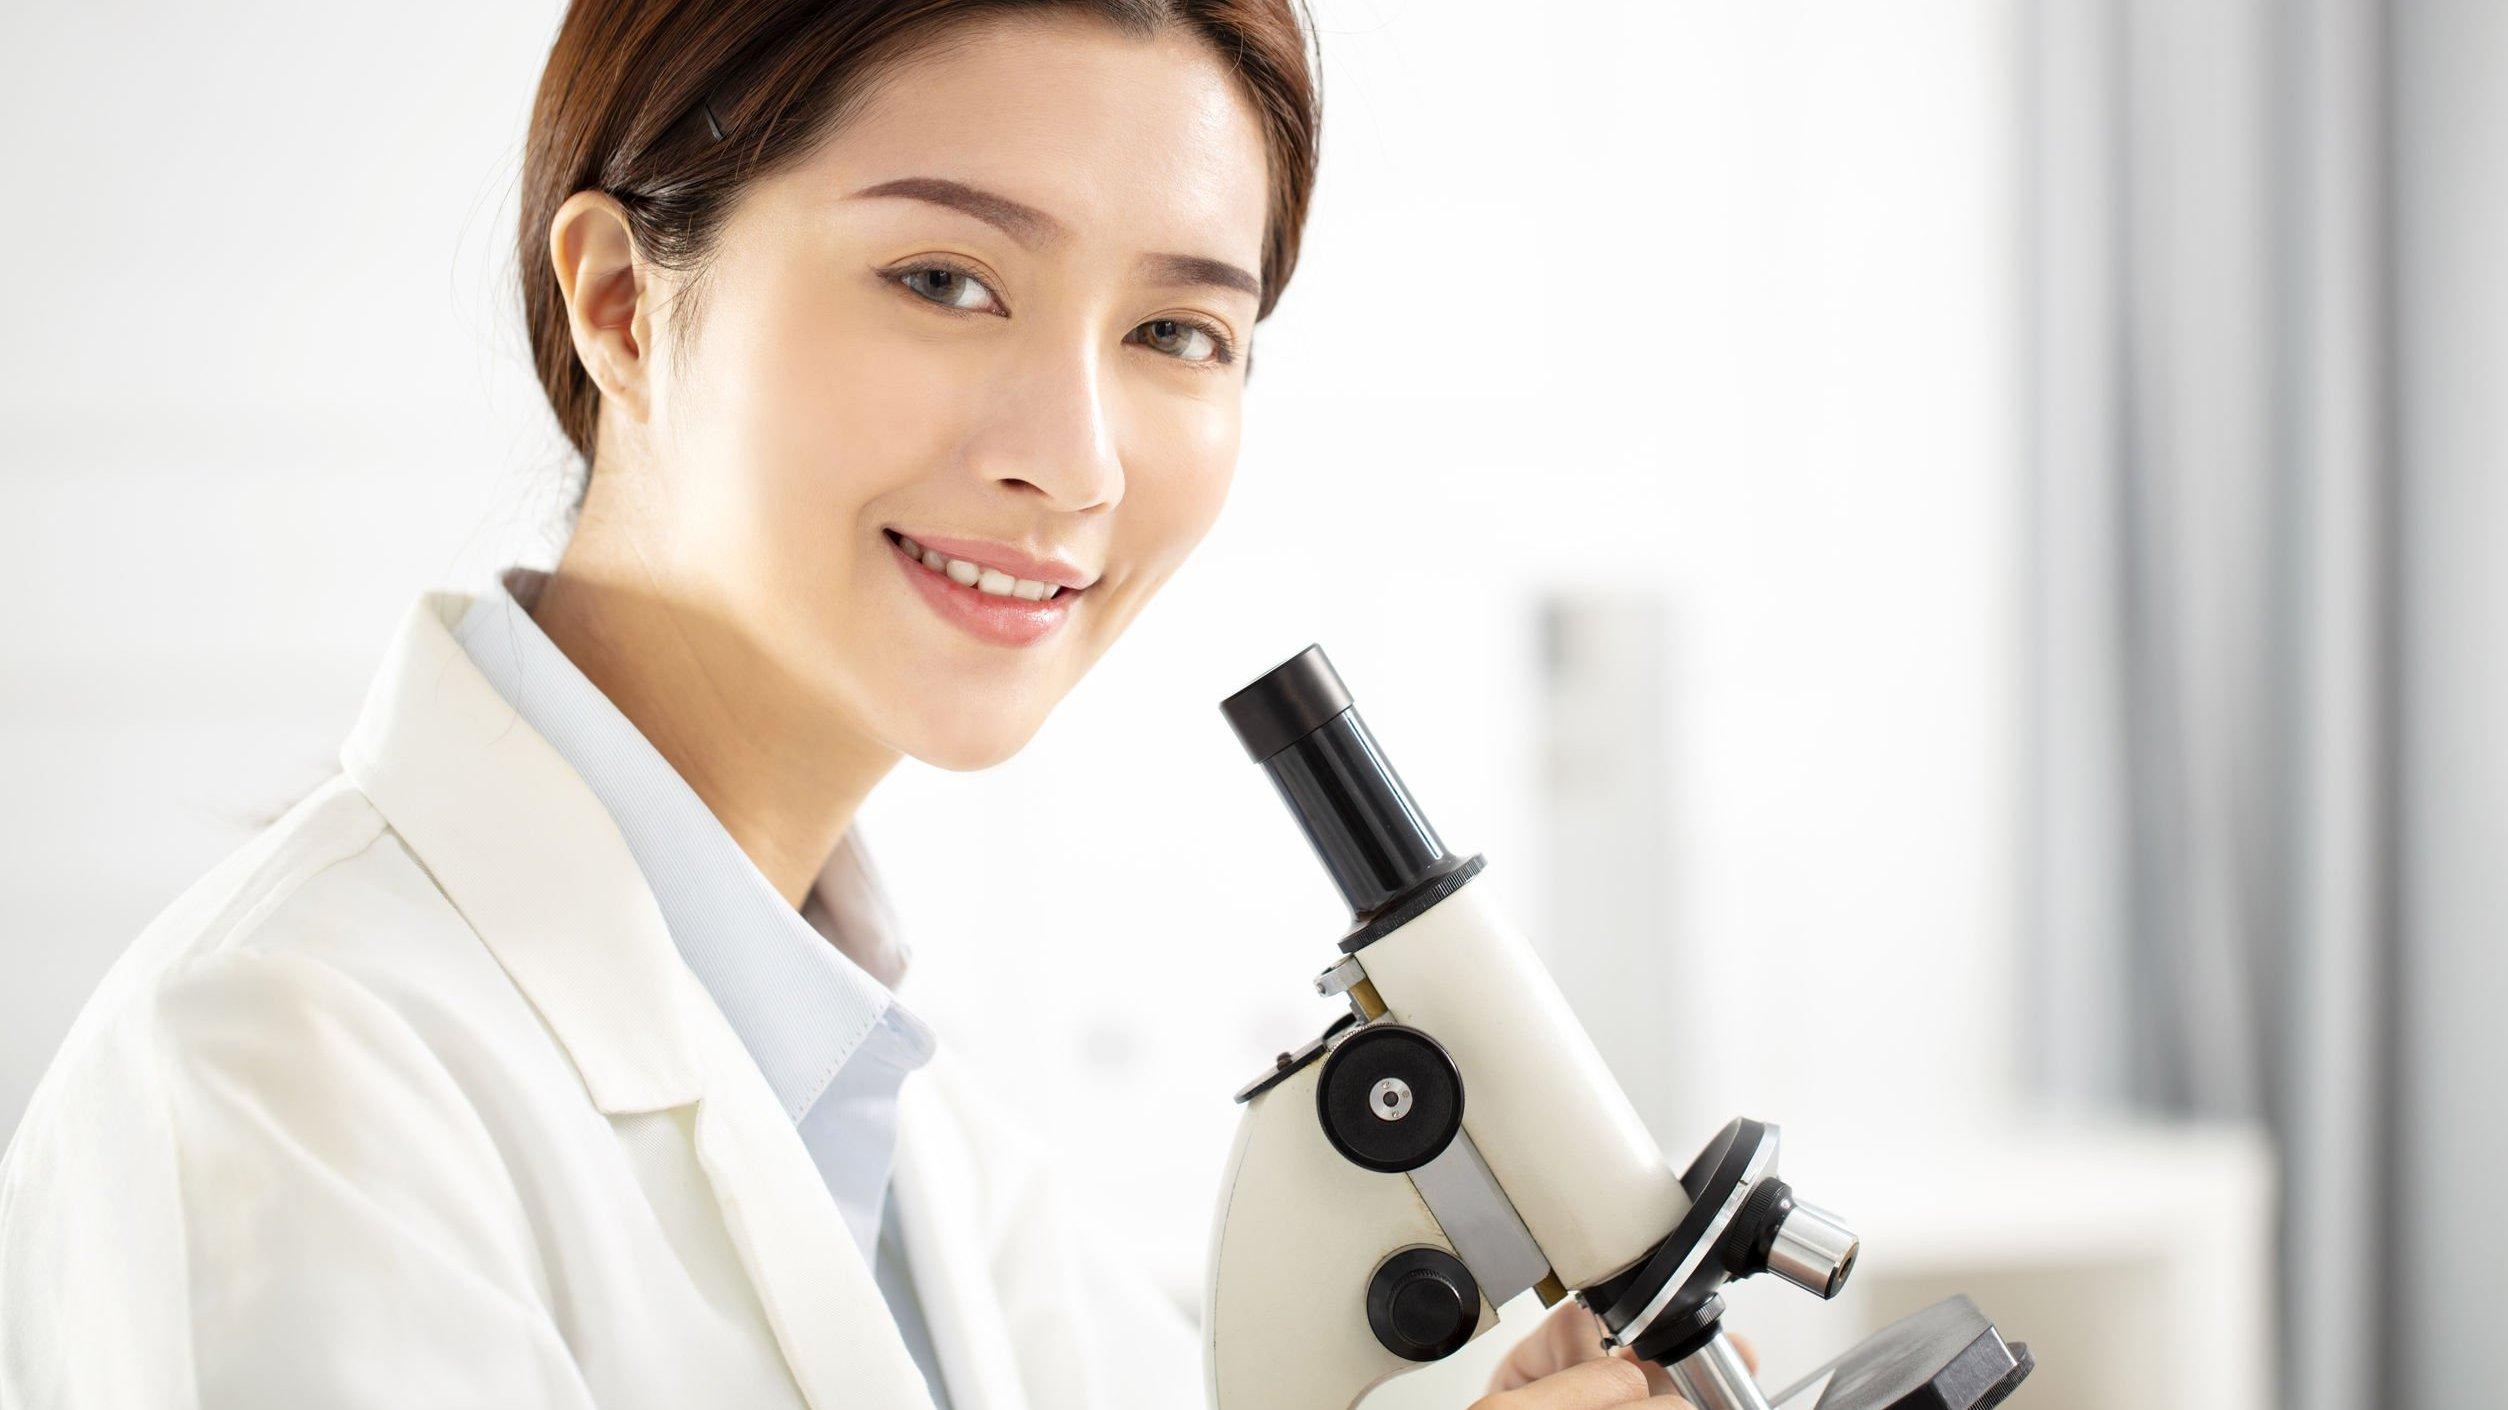 Mulher cientista sorrindo.